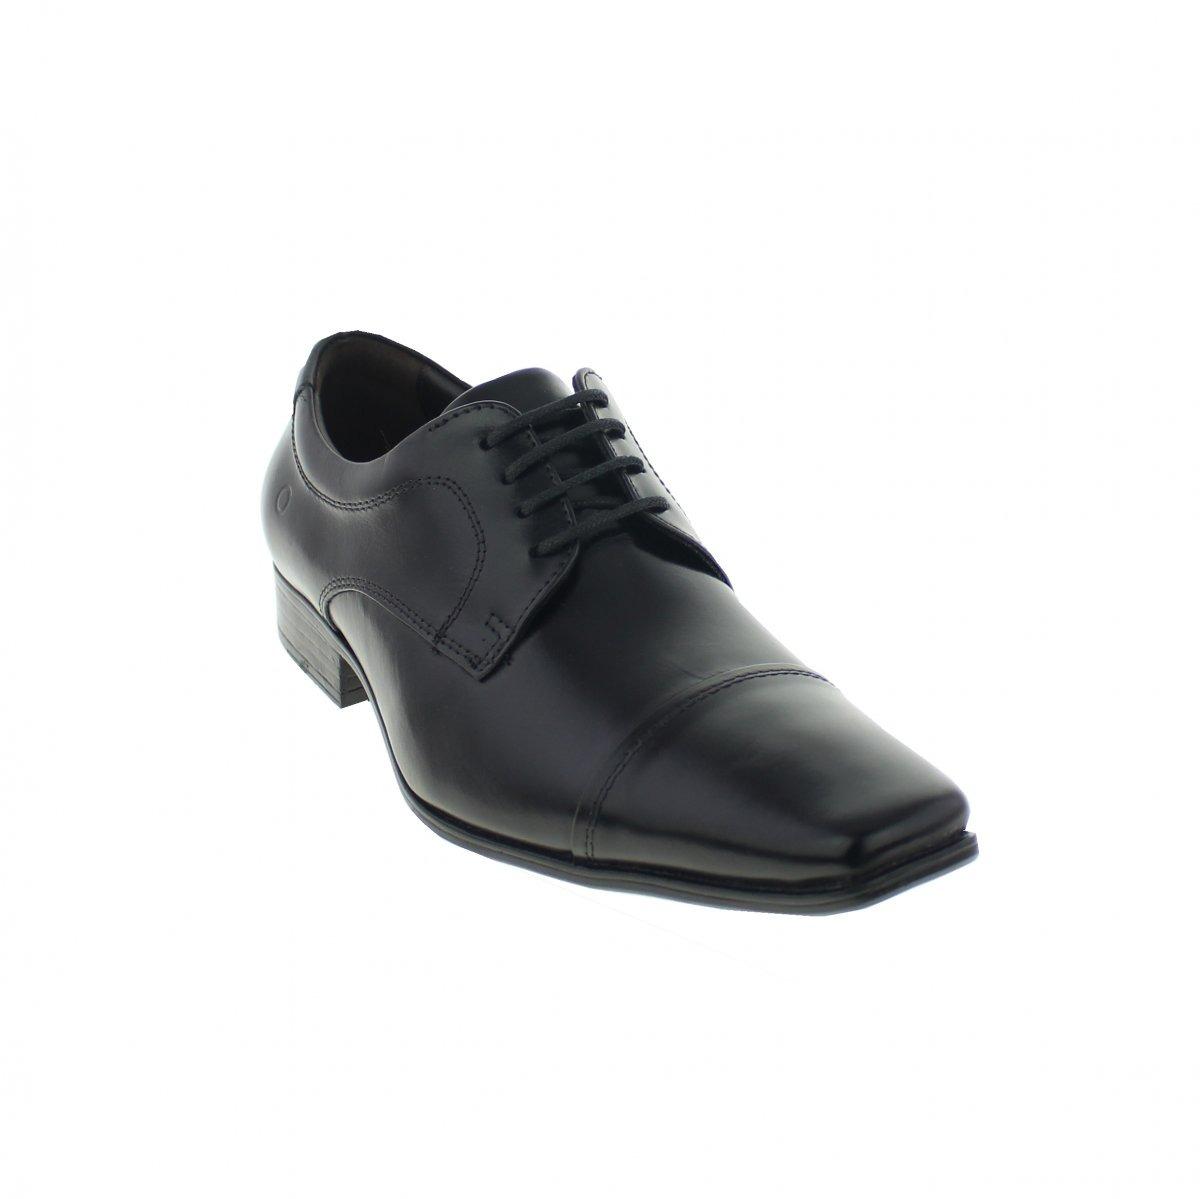 c193e42e17 sapato social masculino democrata 450052-001 em couro preto. Carregando  zoom.